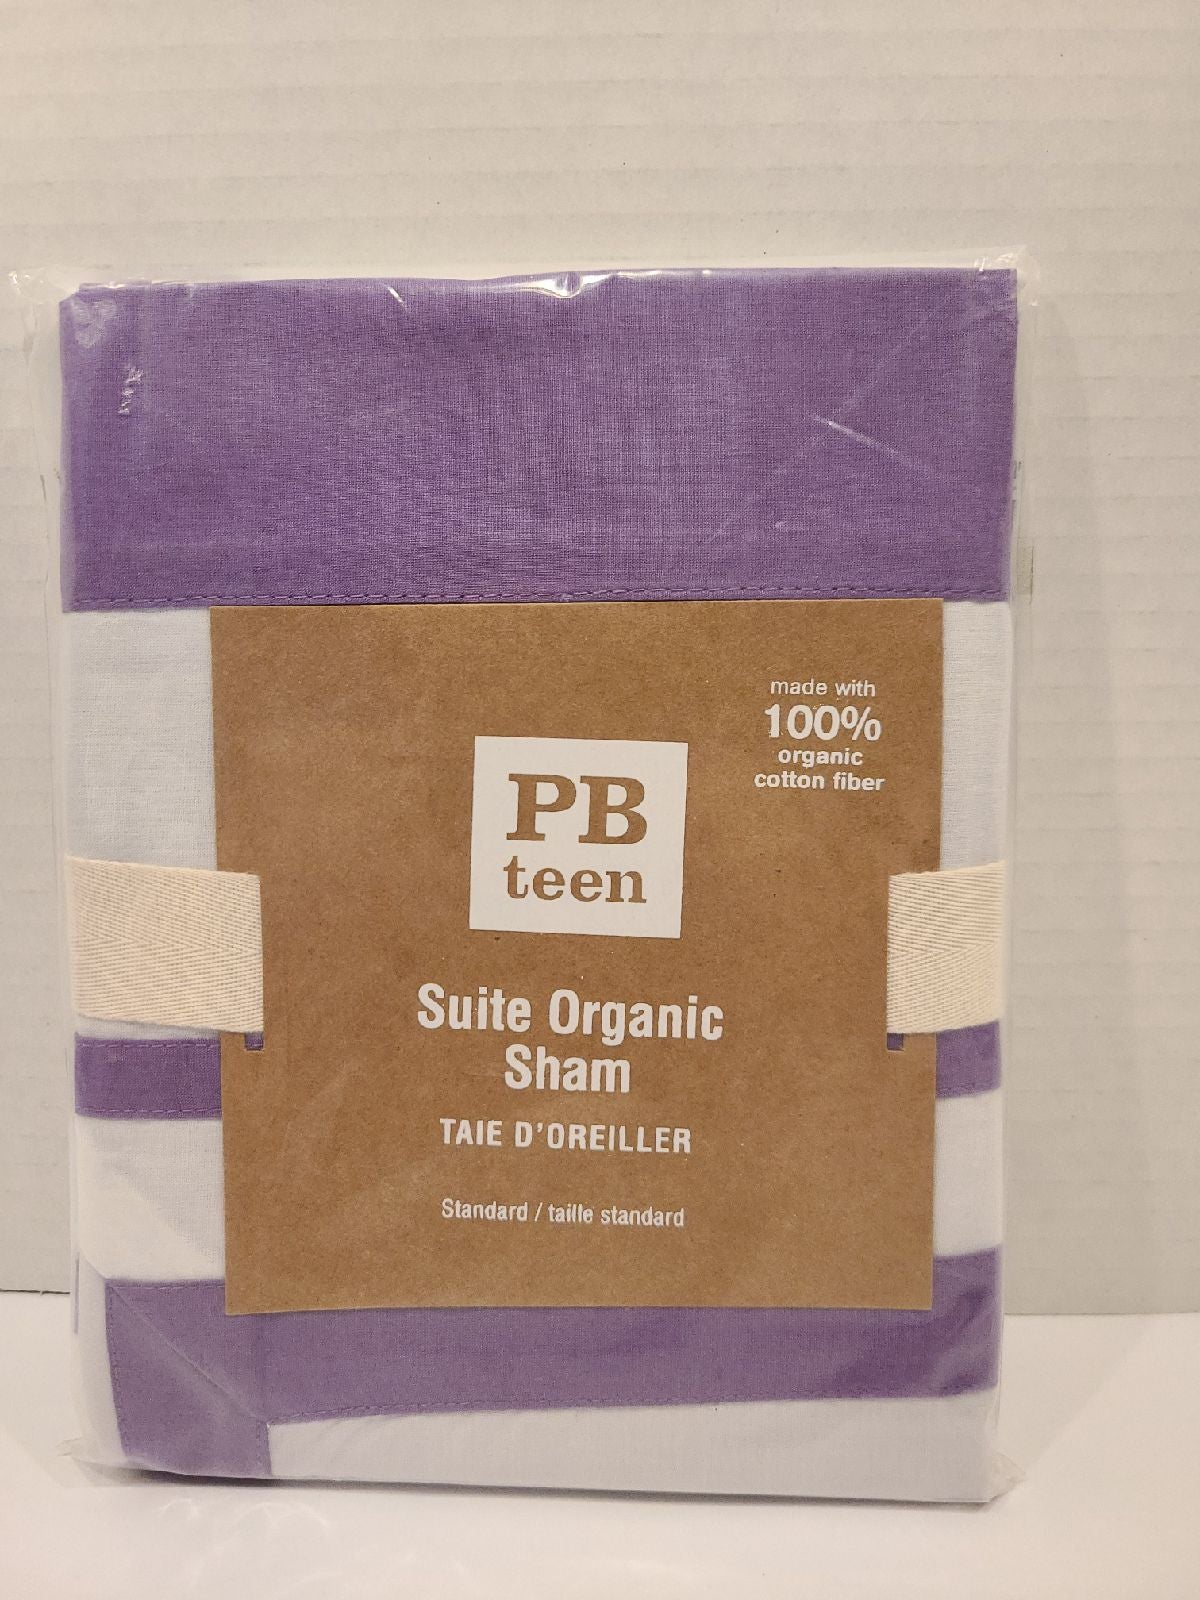 PBteen suite organic sham